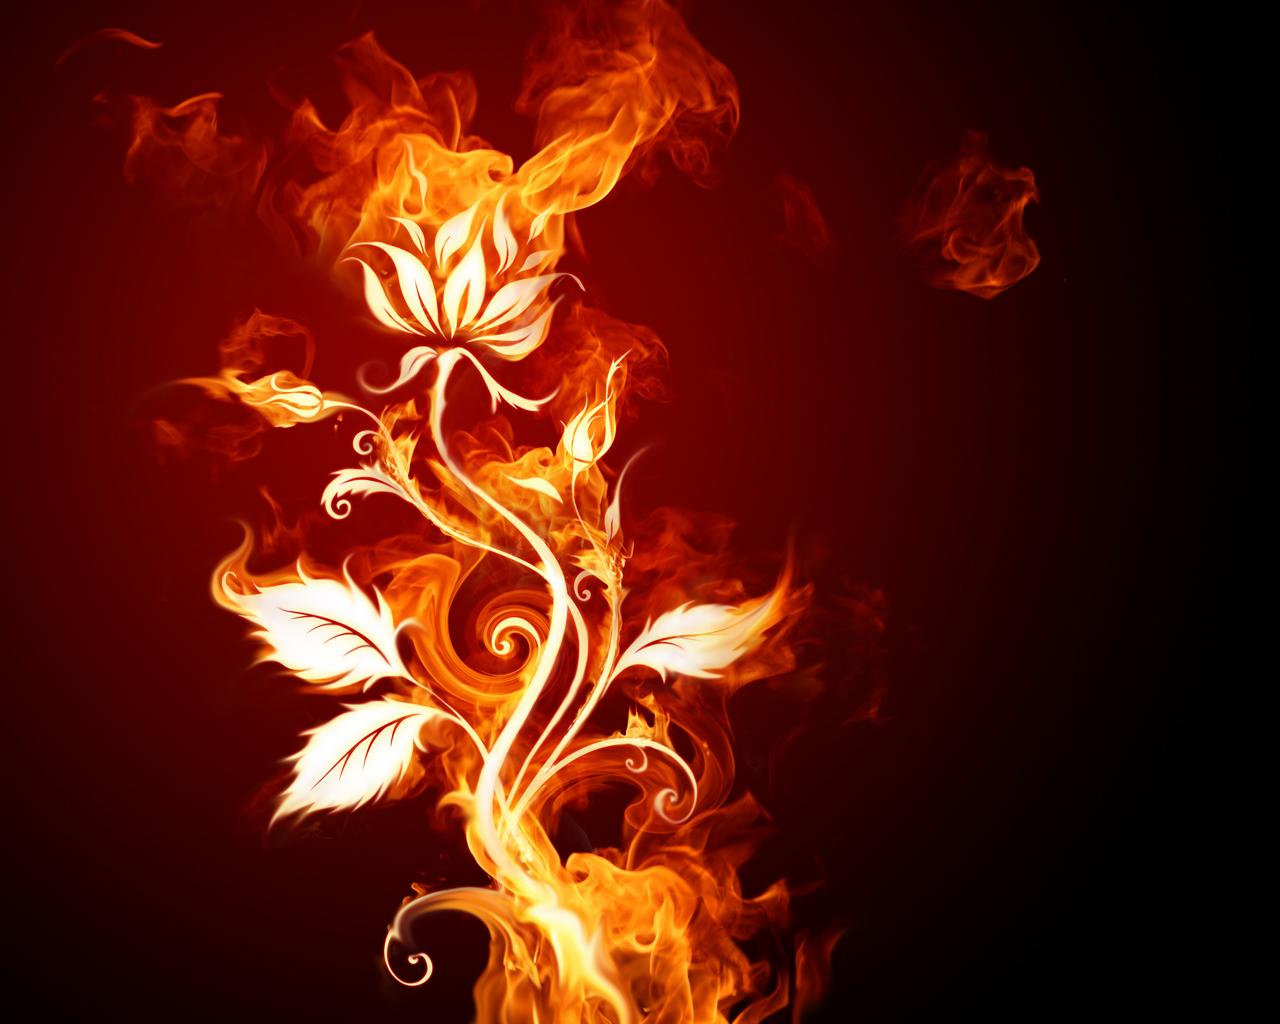 https://2.bp.blogspot.com/-Noiw19R1k5o/TdDUvwv2BZI/AAAAAAAAFBw/LKc-yjwLVAw/s1600/Wallcate.com+-++Fire+HD+Wallpapers+.jpg